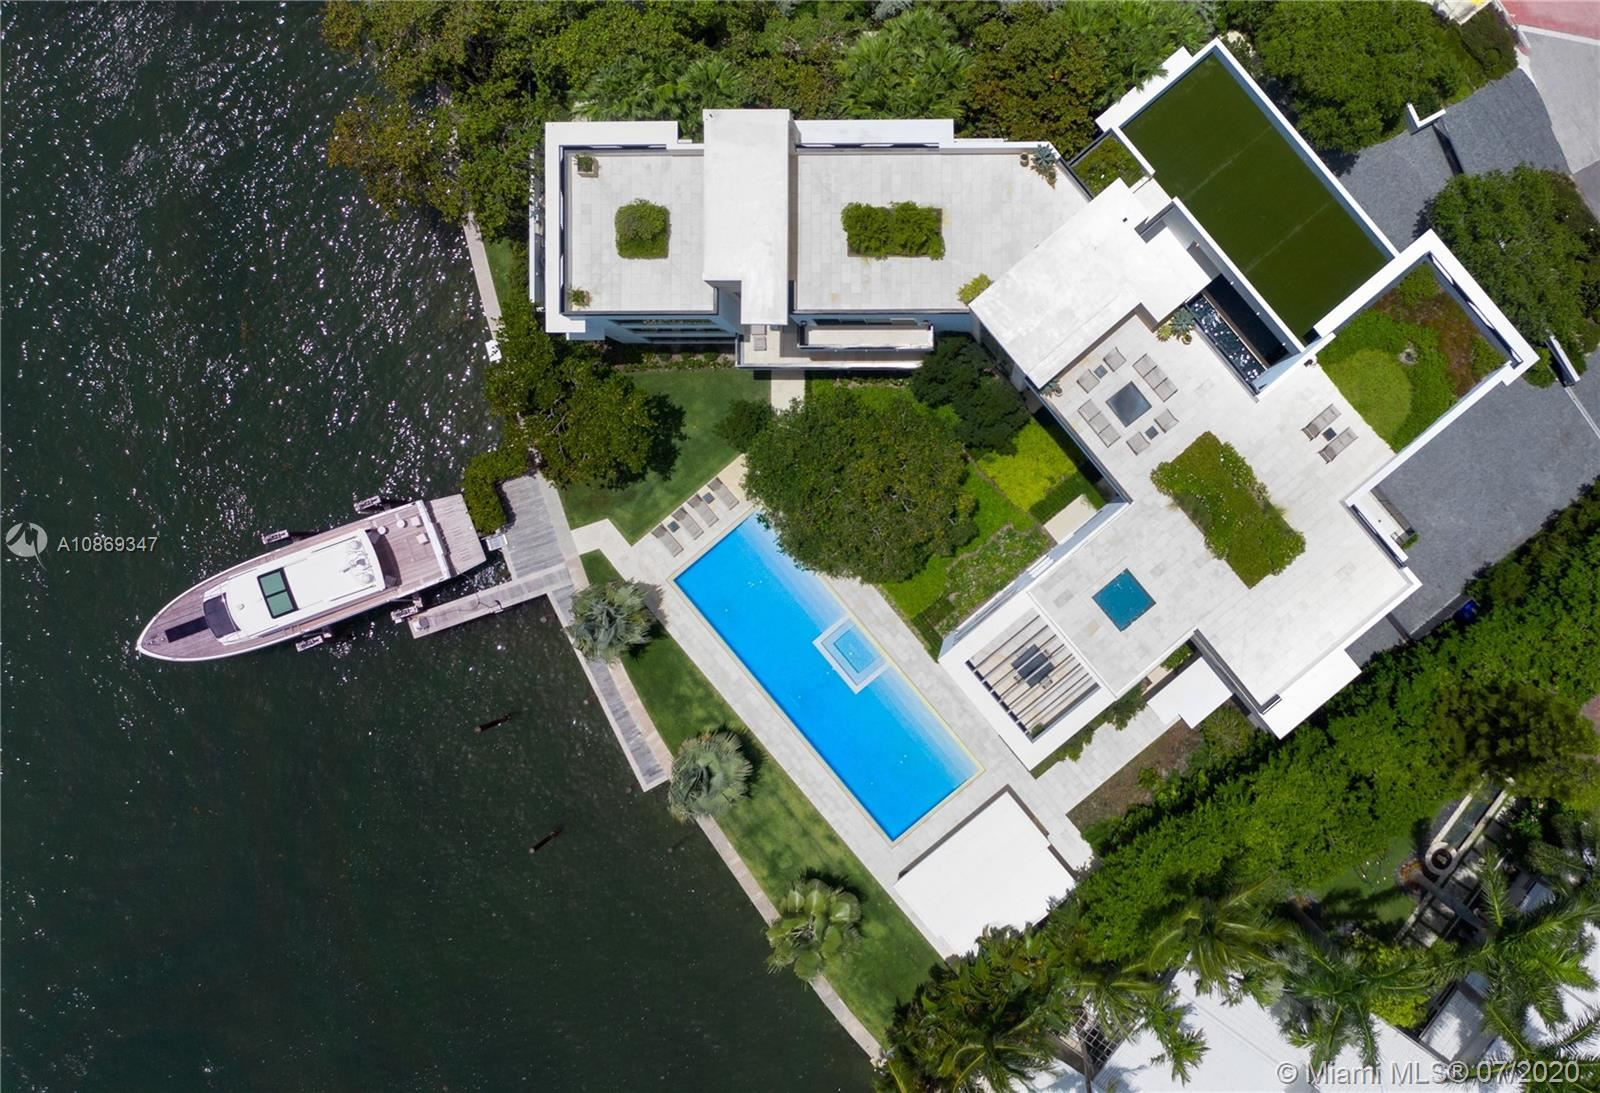 Photo 24 of Listing MLS a10869347 in 1429 N Venetian Way Miami FL 33139